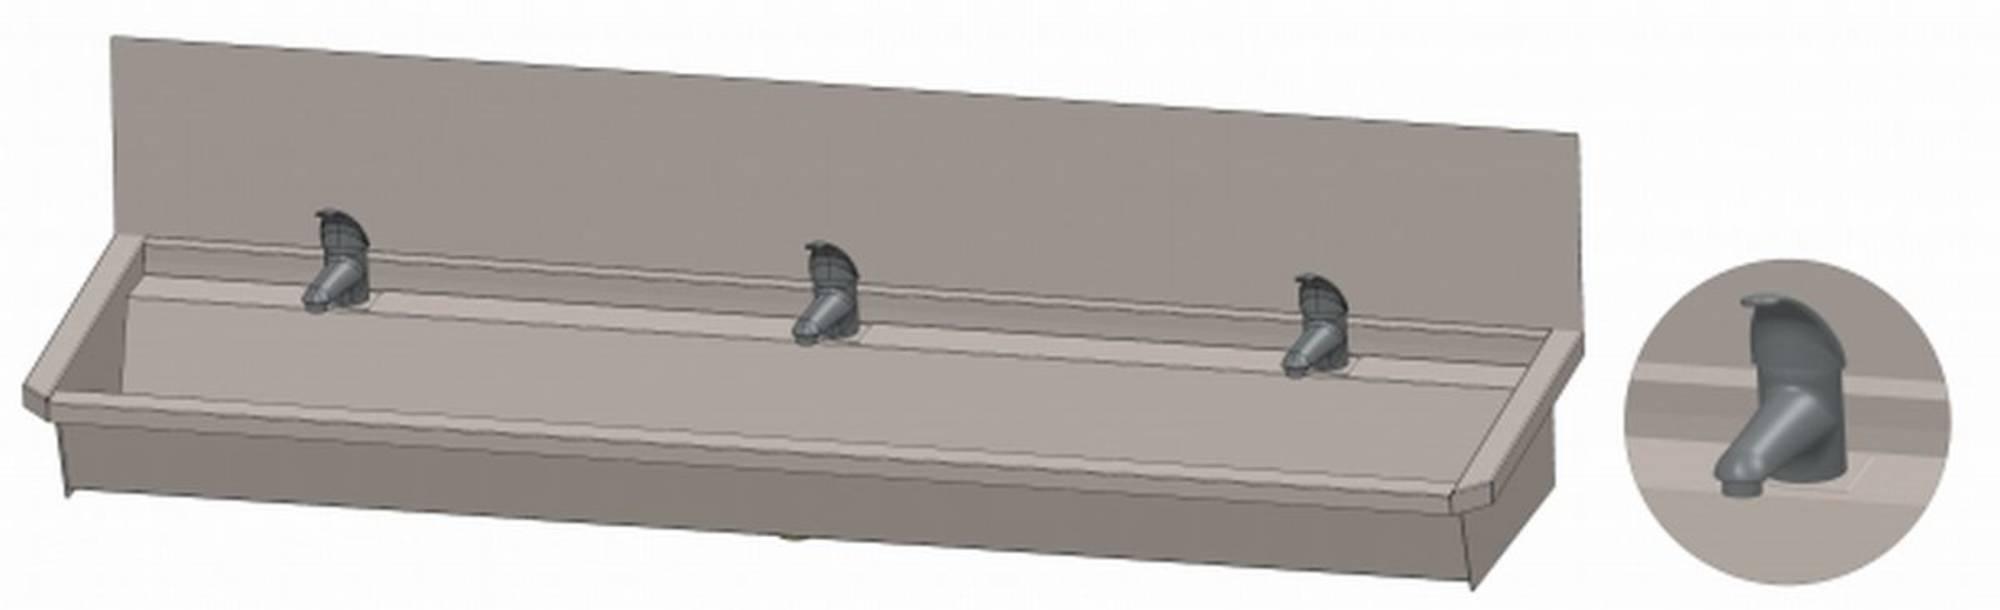 INTERSAN SANILAV wasgoot met spatbord 180 cm. met 3 1-greeps kranen INOX 304 (303L4)